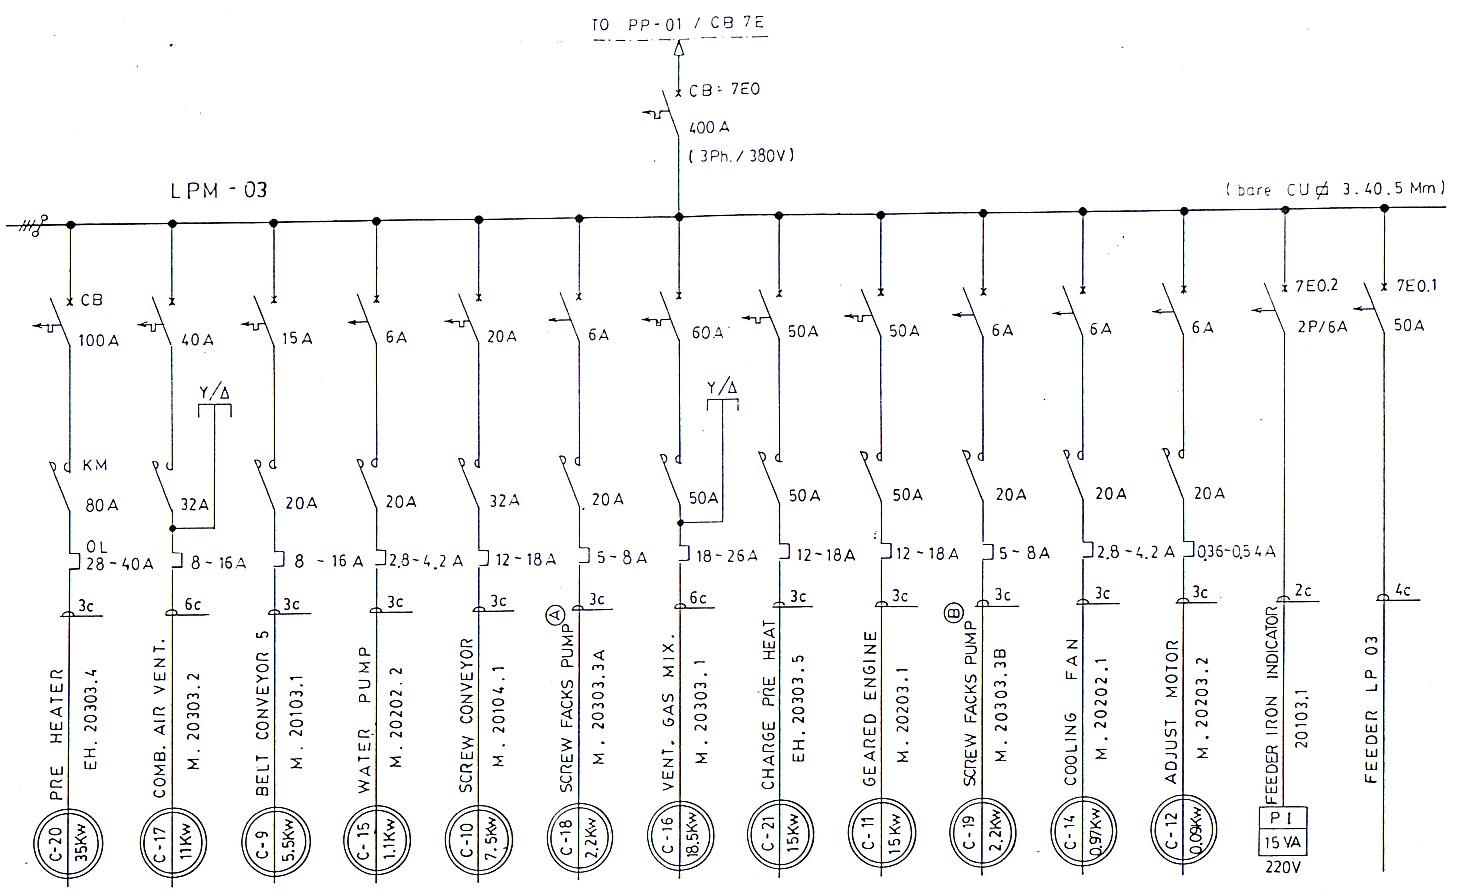 Admirable Wrg 7265 Penerangan Gambar Single Line Wiring Diagram Wiring 101 Akebretraxxcnl